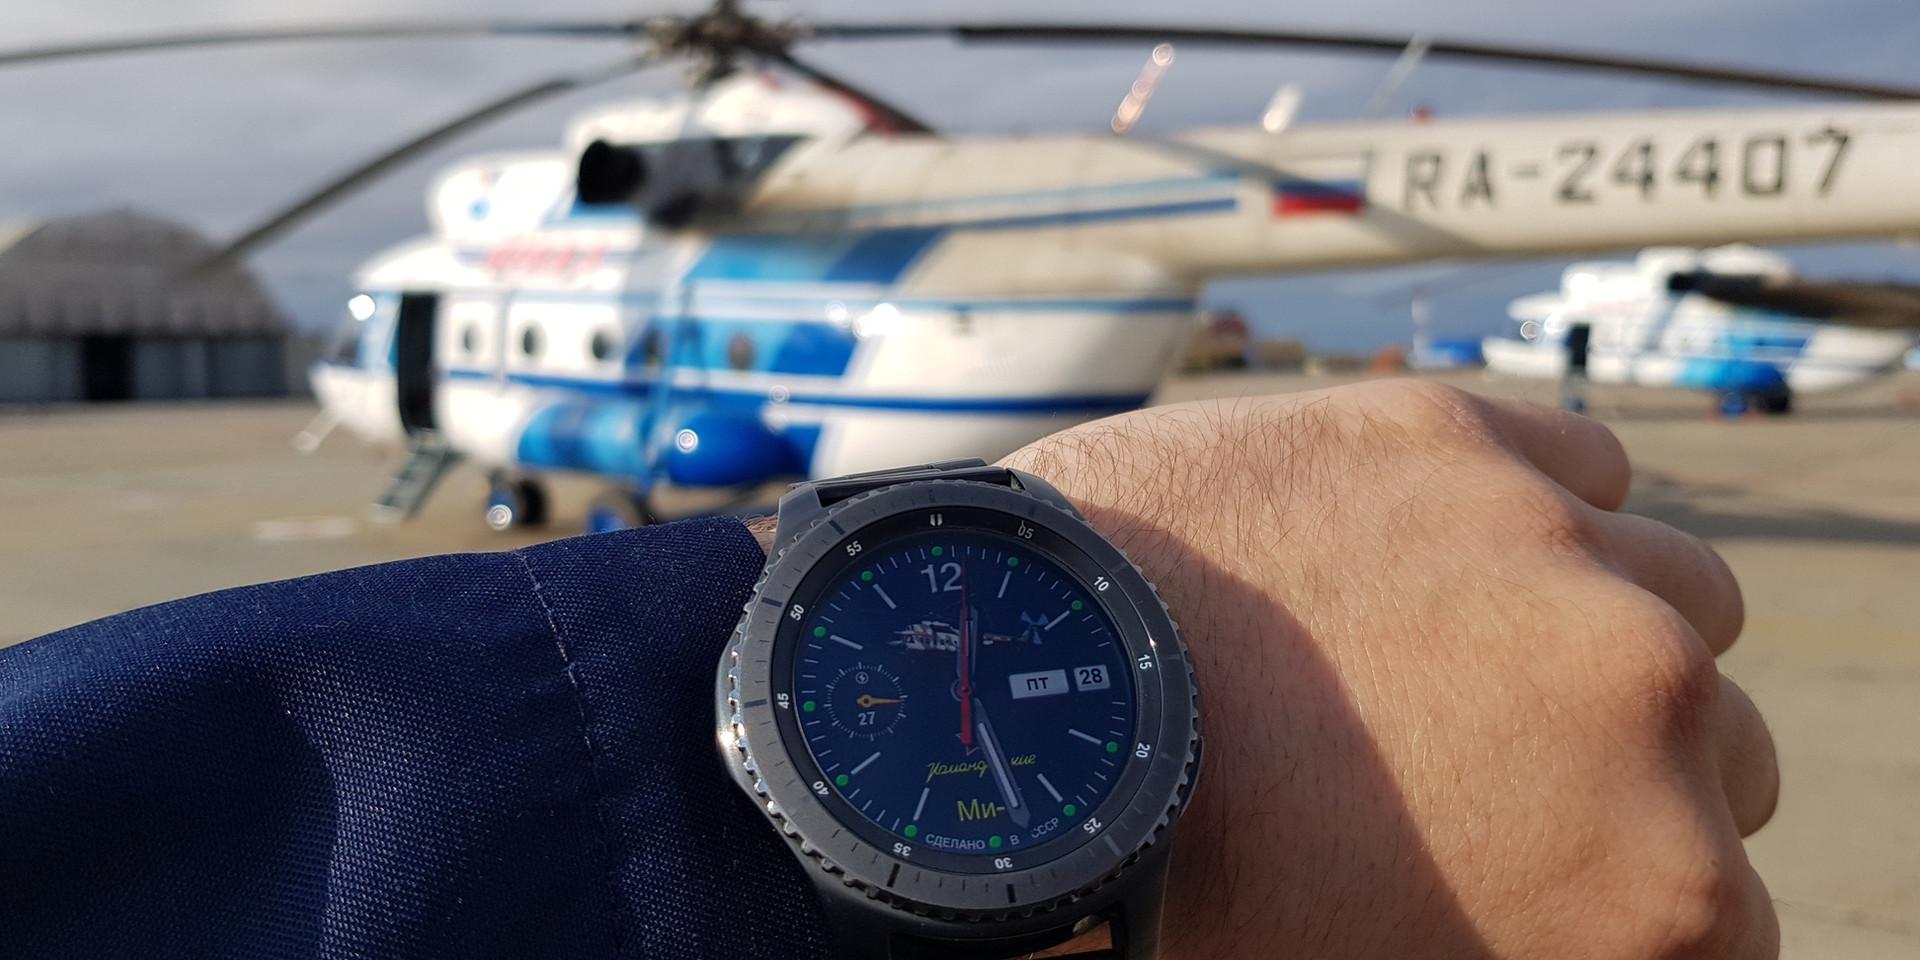 Ми-8 вживую и на часах